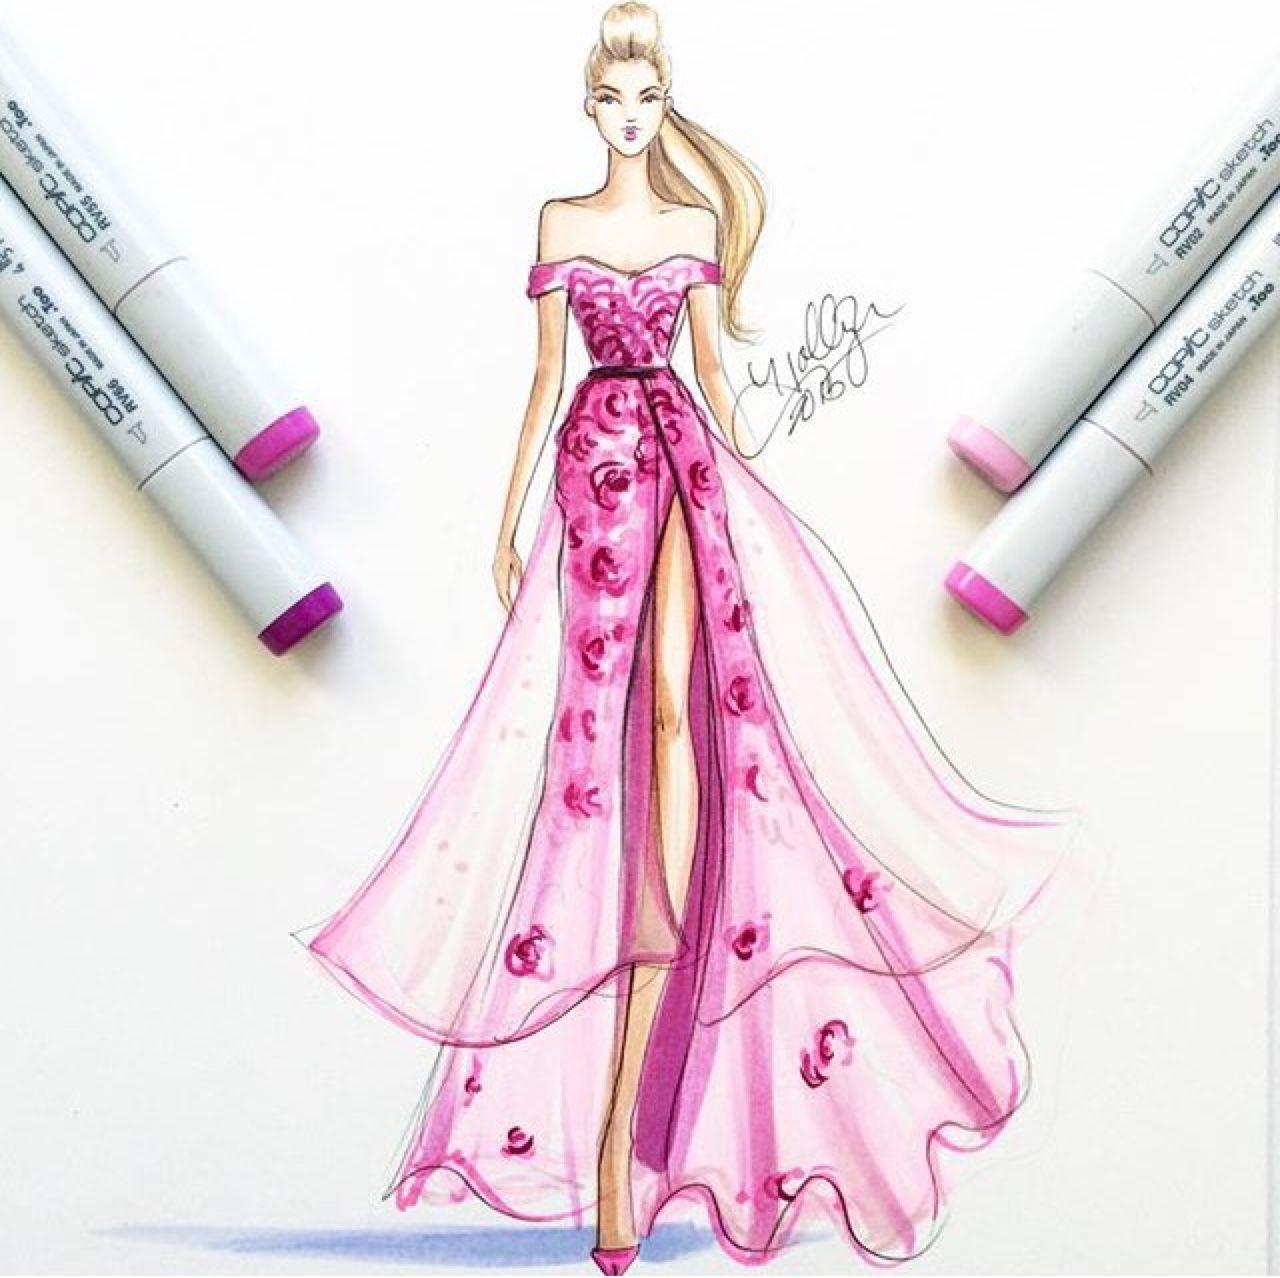 Pink dress drawing  pink dress in copics by hnicholsillustration  Fashion illustration